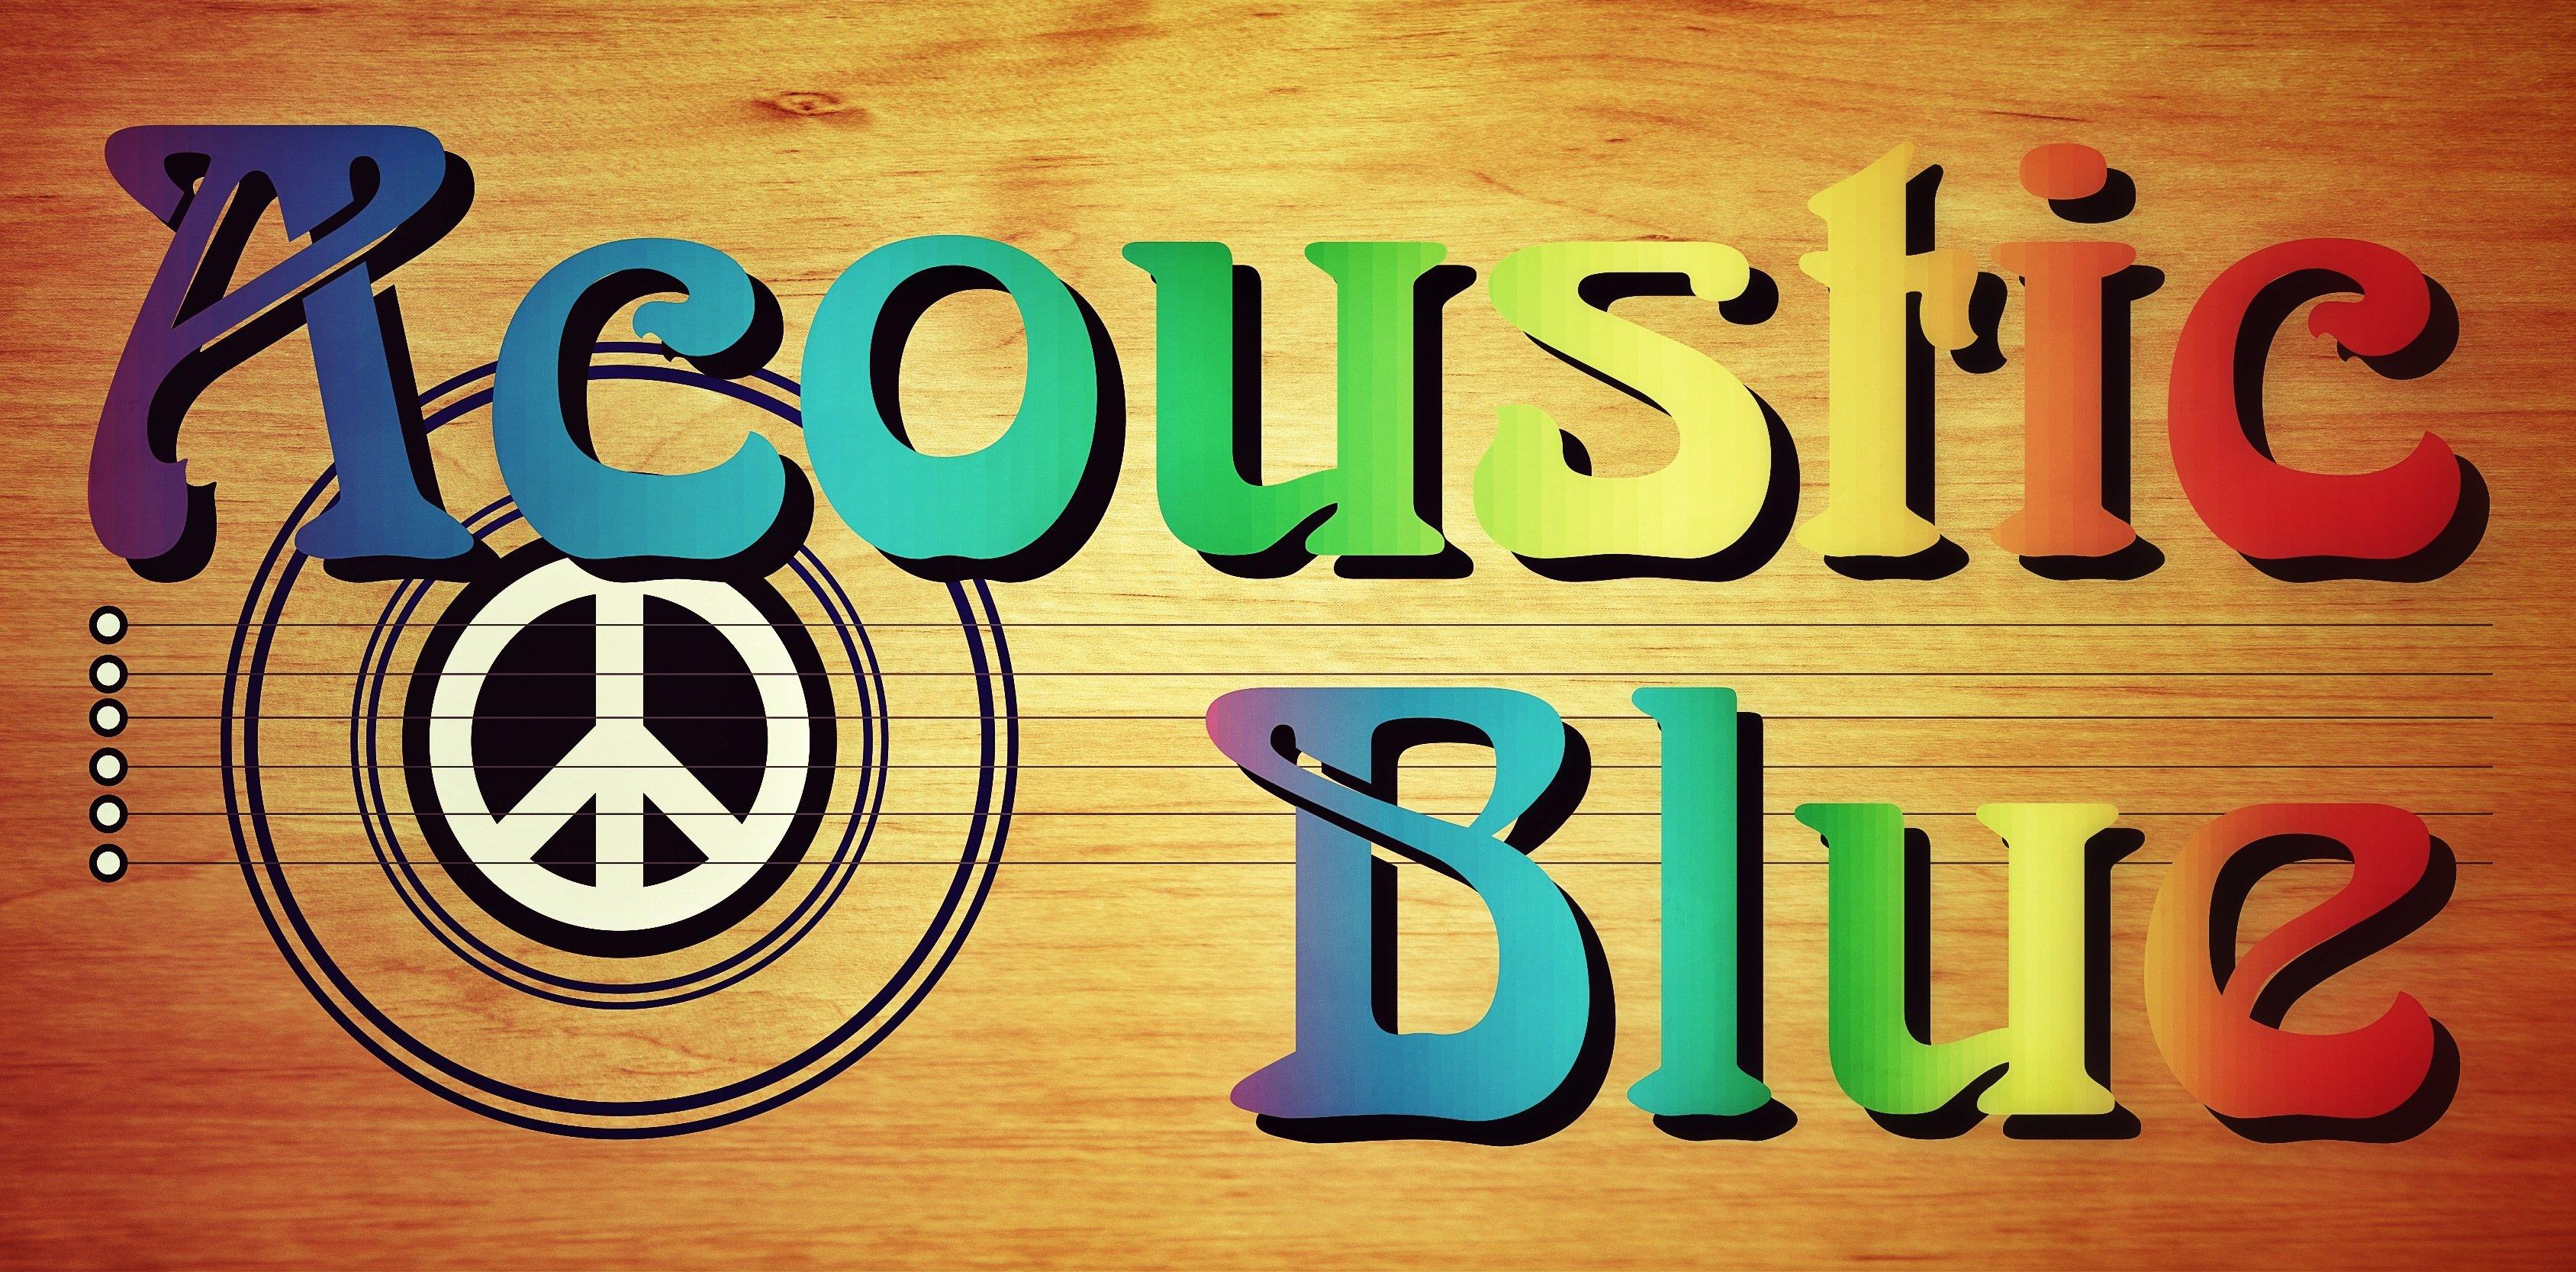 Acoustc Blue Logo - Liquid Blue